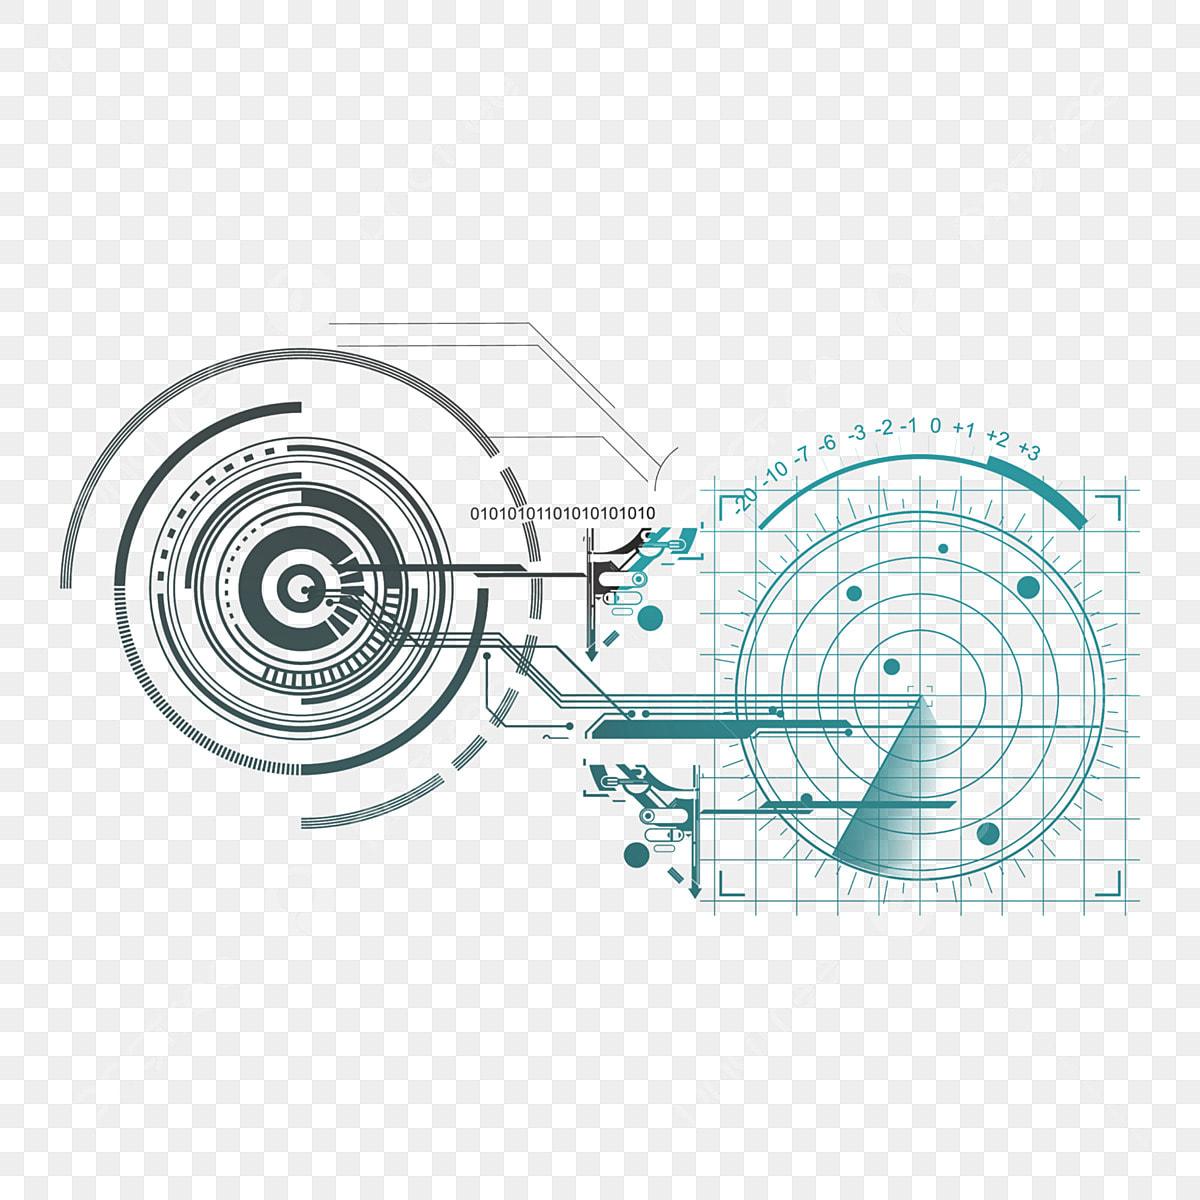 Technology Circuit Diagram Circuit Board Electronic